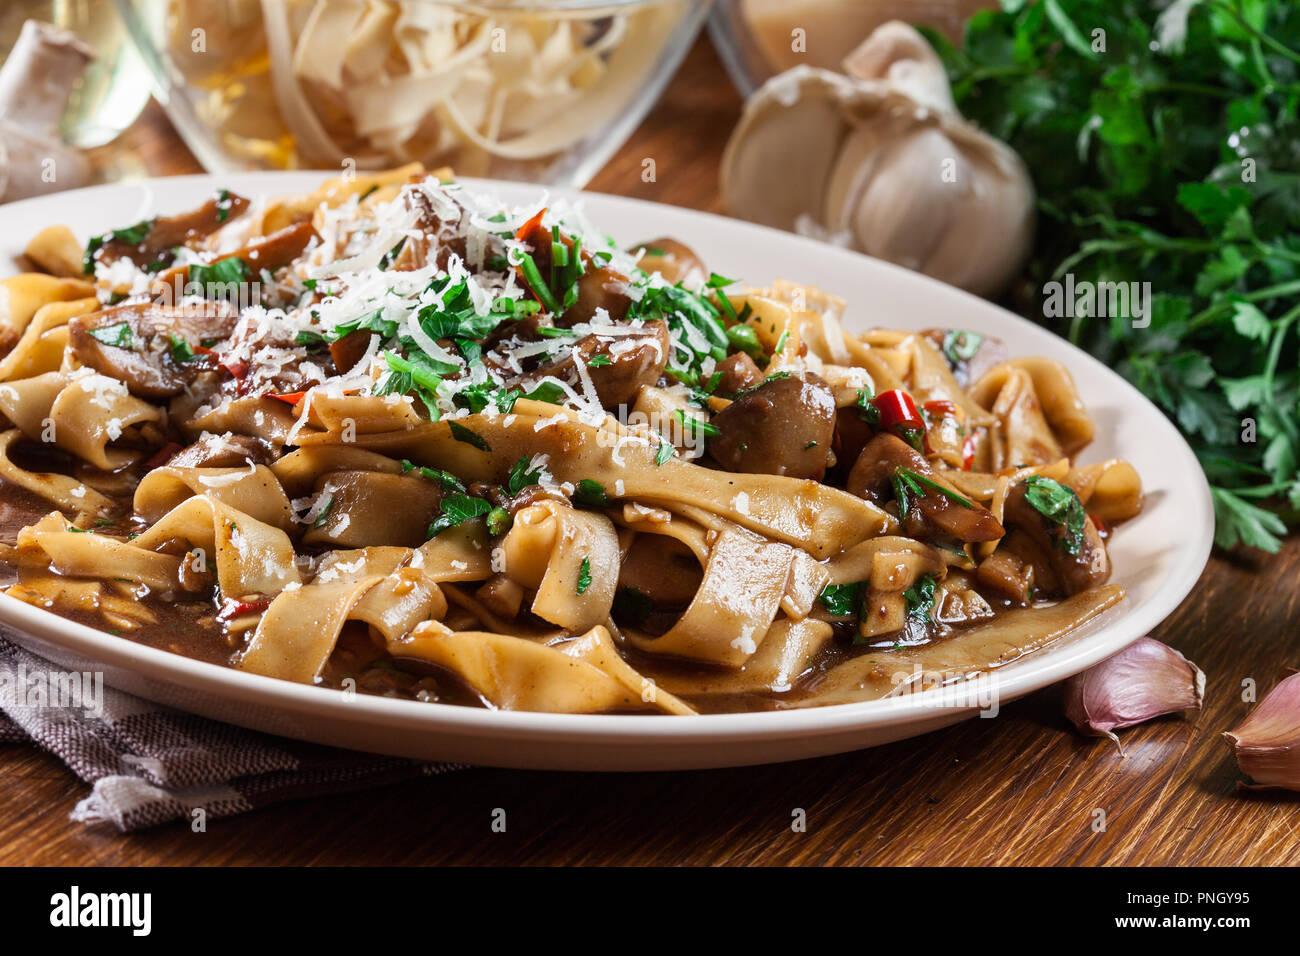 Tagliatelle pasta with champignon in mushroom gravy. Italian dish - Stock Image